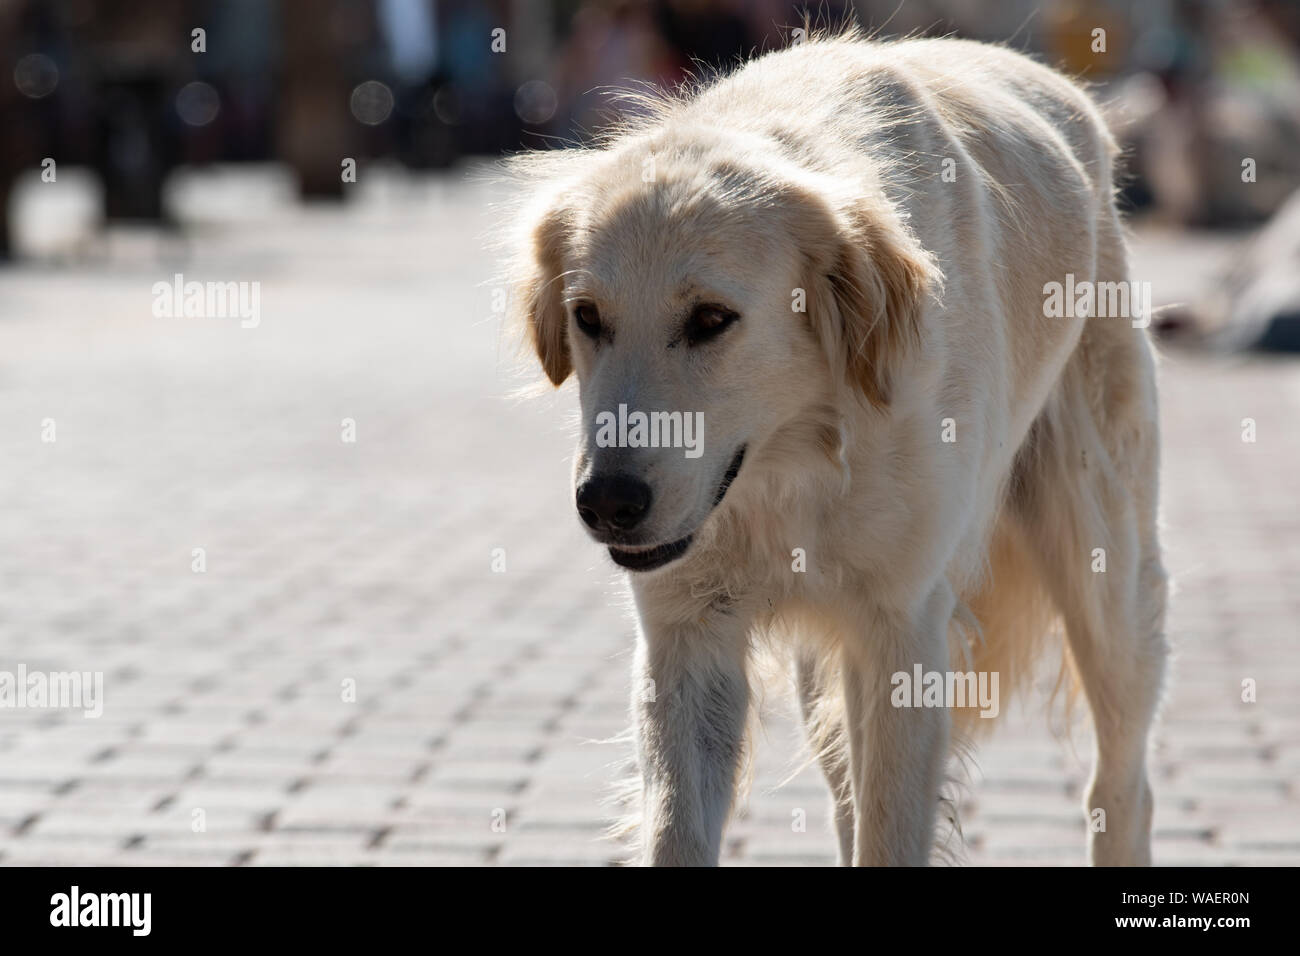 Abandoned homeless stray dog walking alone at the waterfront